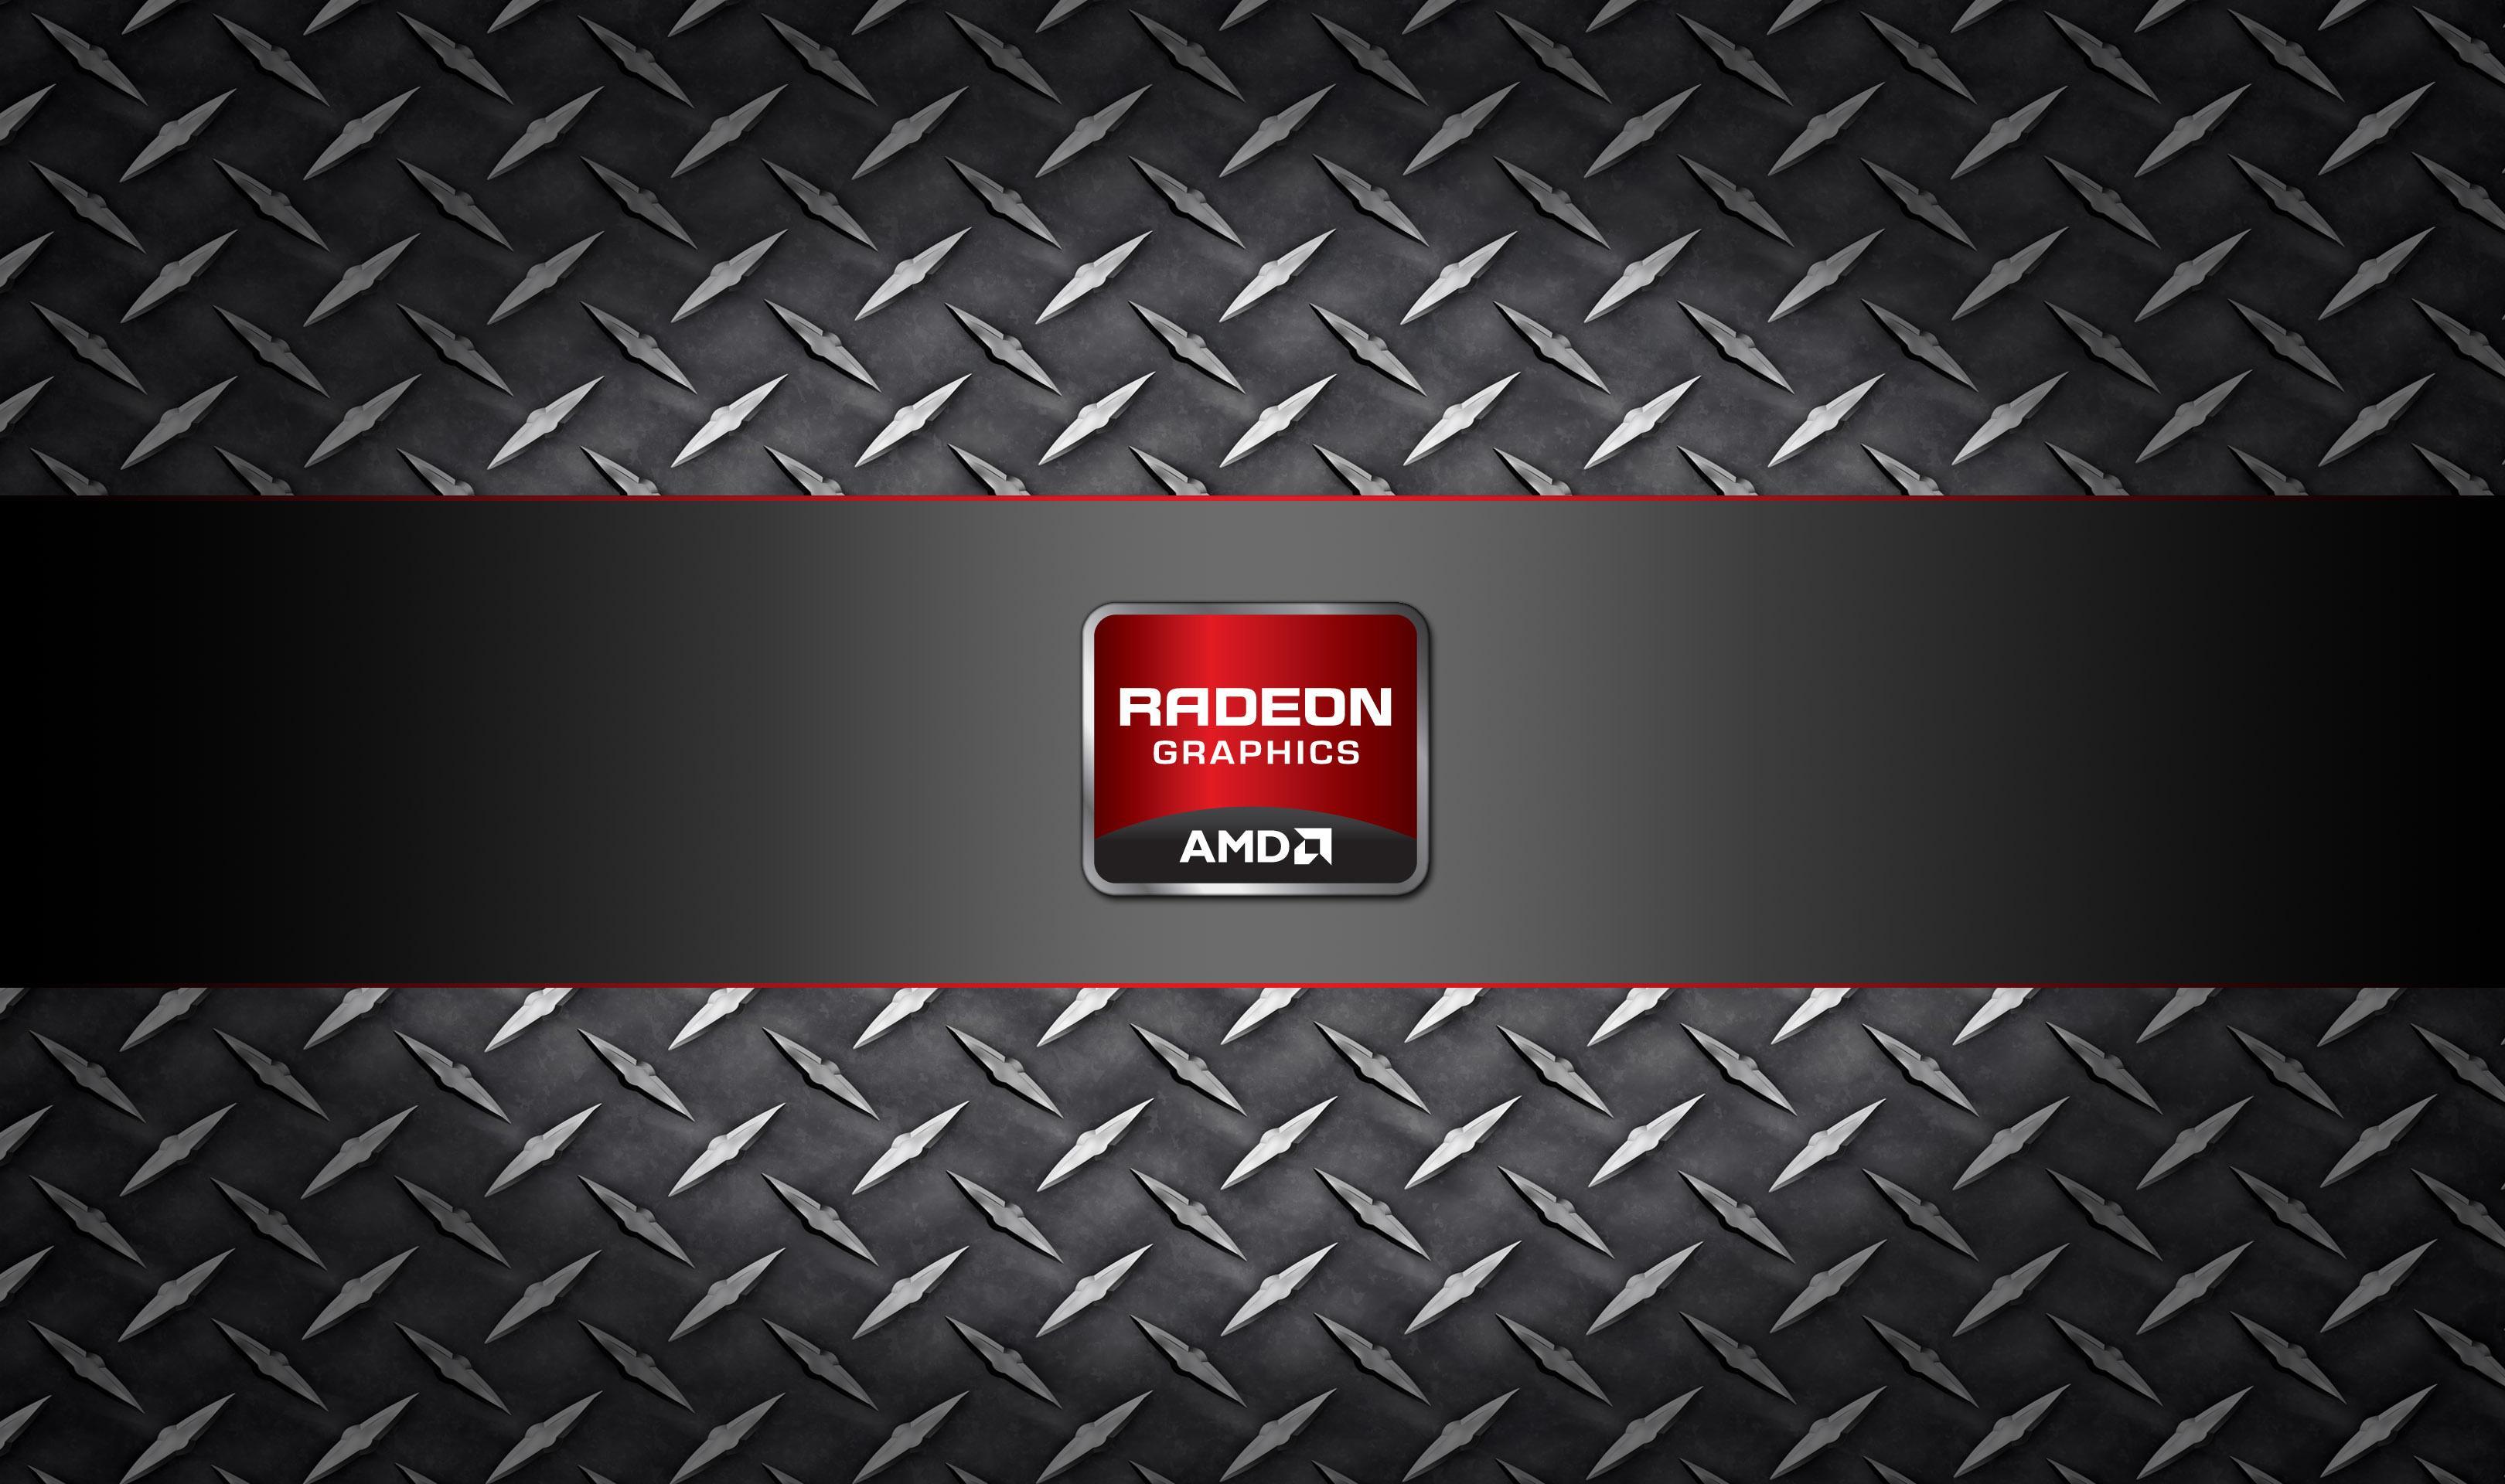 Amd Radeon Wallpaper 1920x1080 Just made an amd radeon 3240x1920